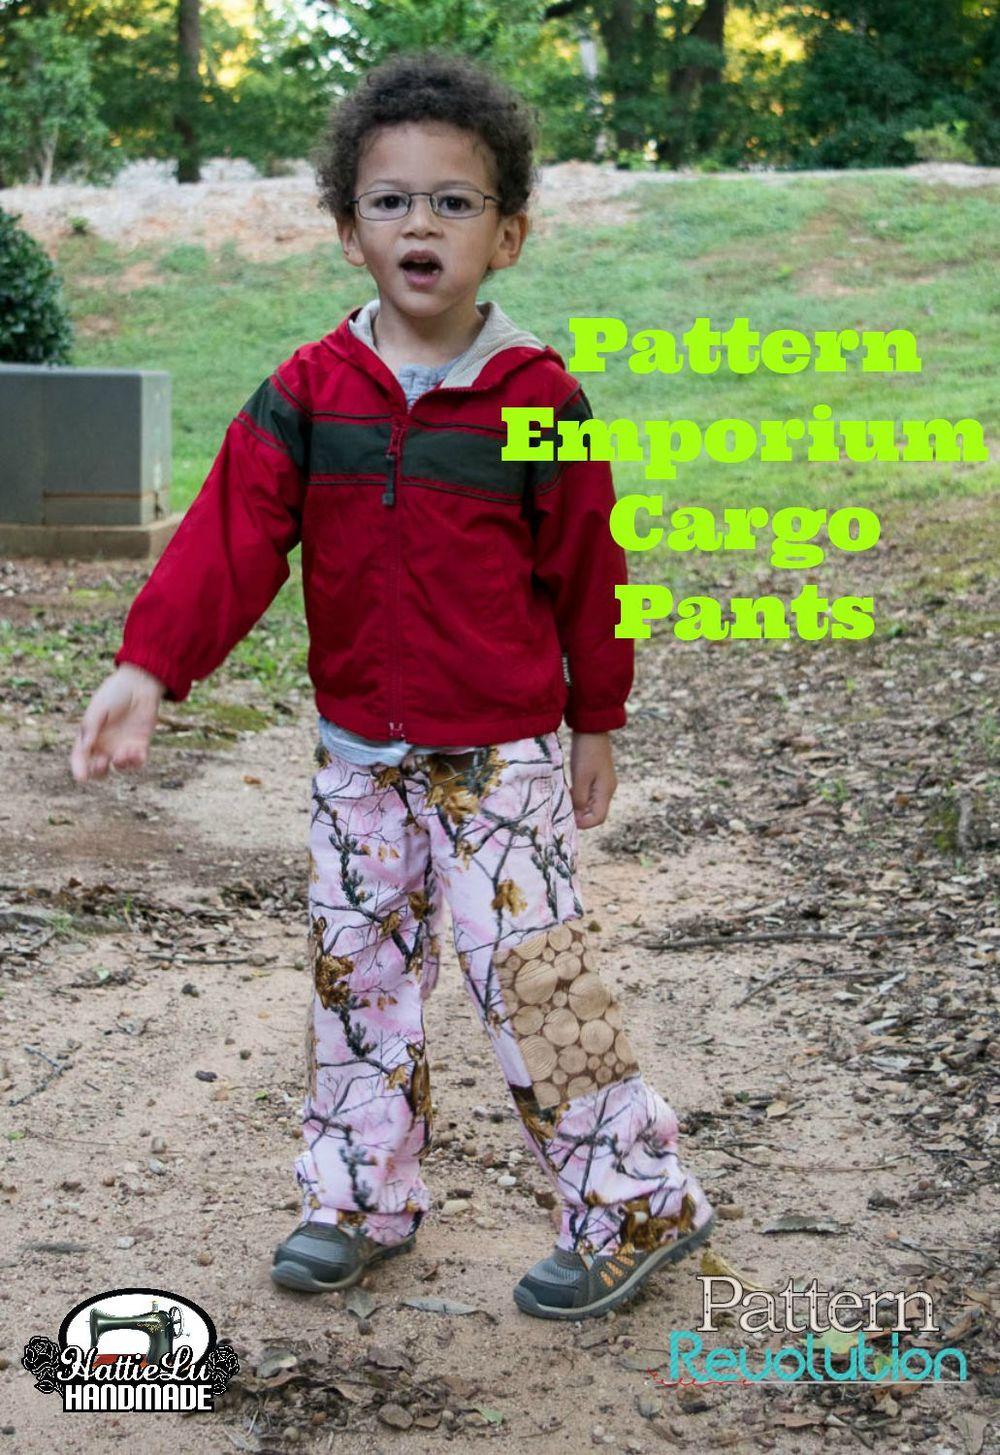 PR Pattern Emporium Cargo Pants.jpg